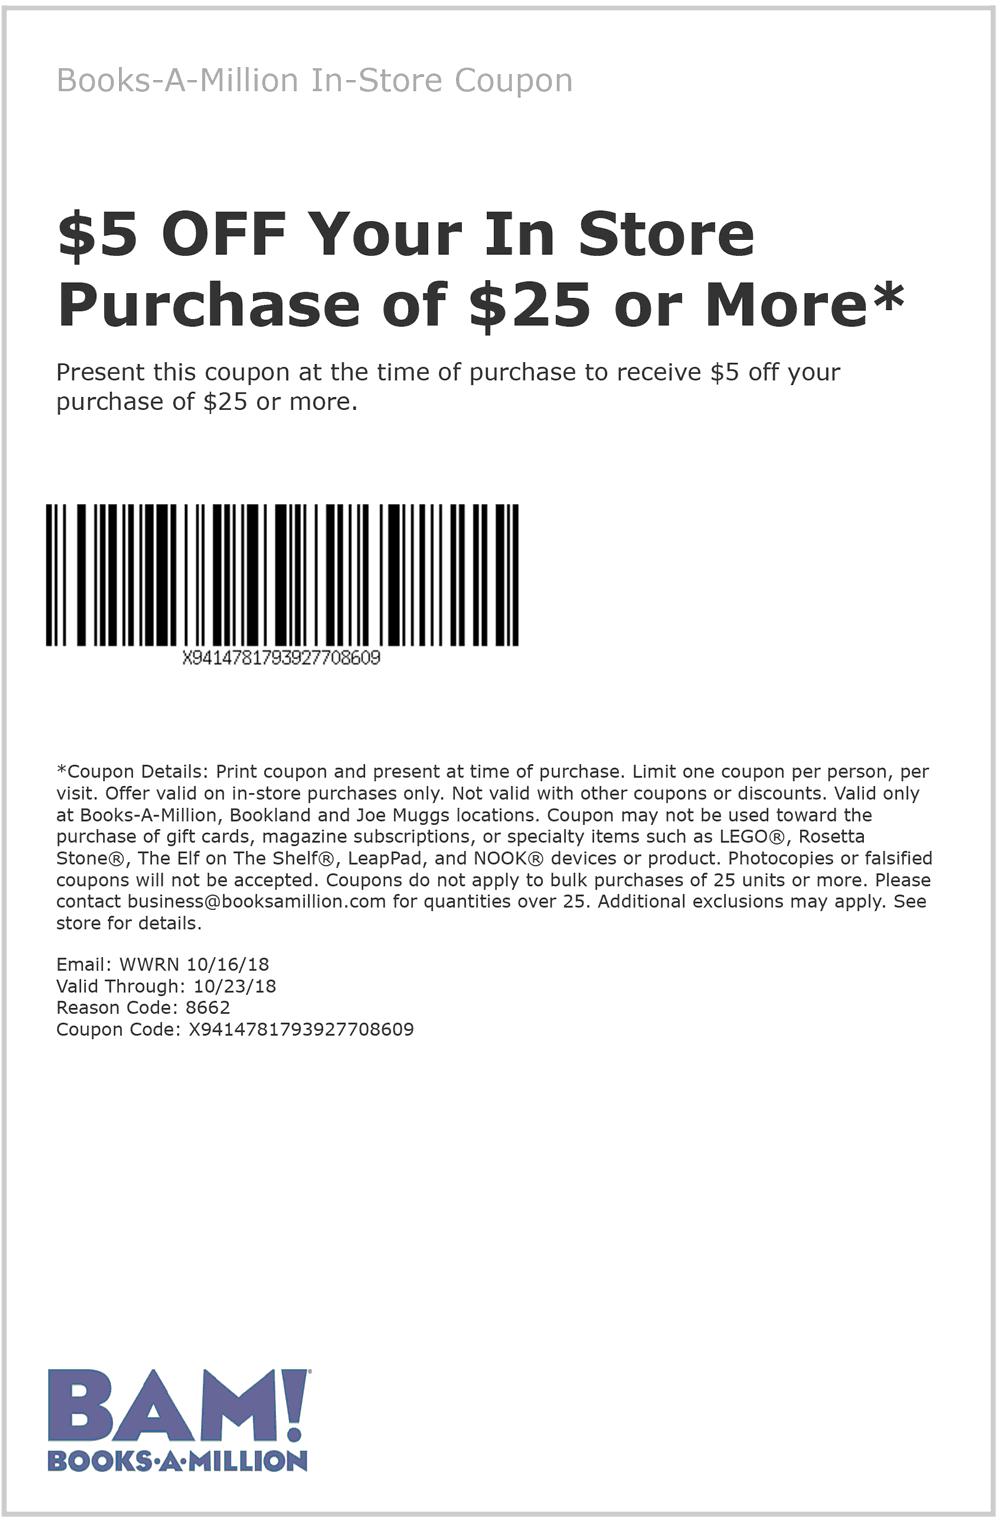 Books-A-Million.com Promo Coupon $5 off $25 at Books-A-Million